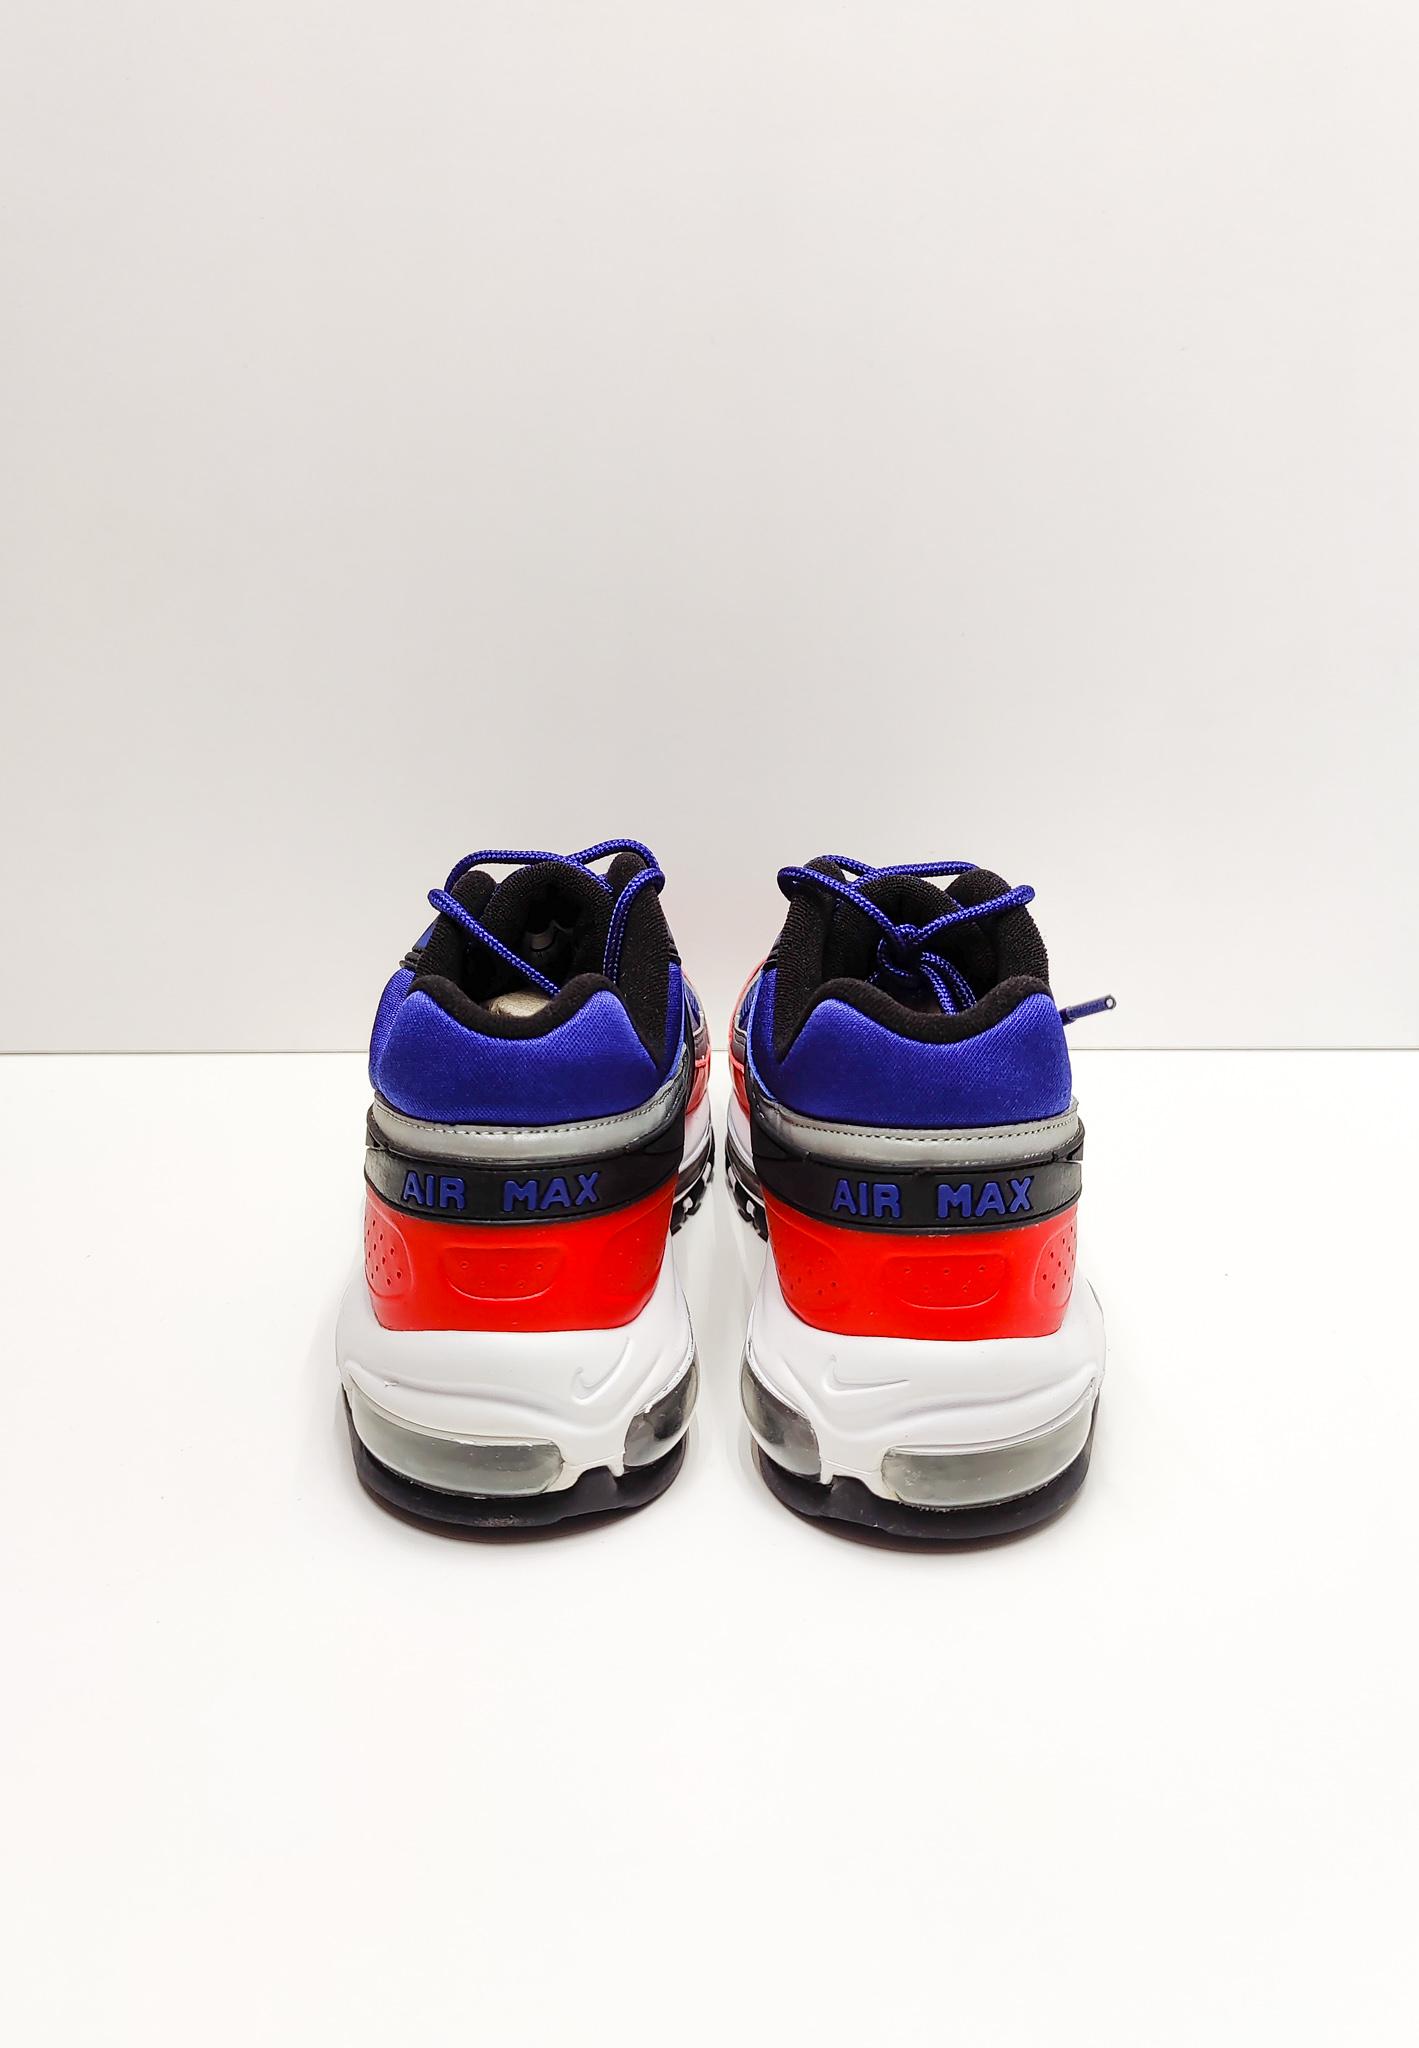 Nike Air Max 97 BW Deep Royal Blue Black University Red